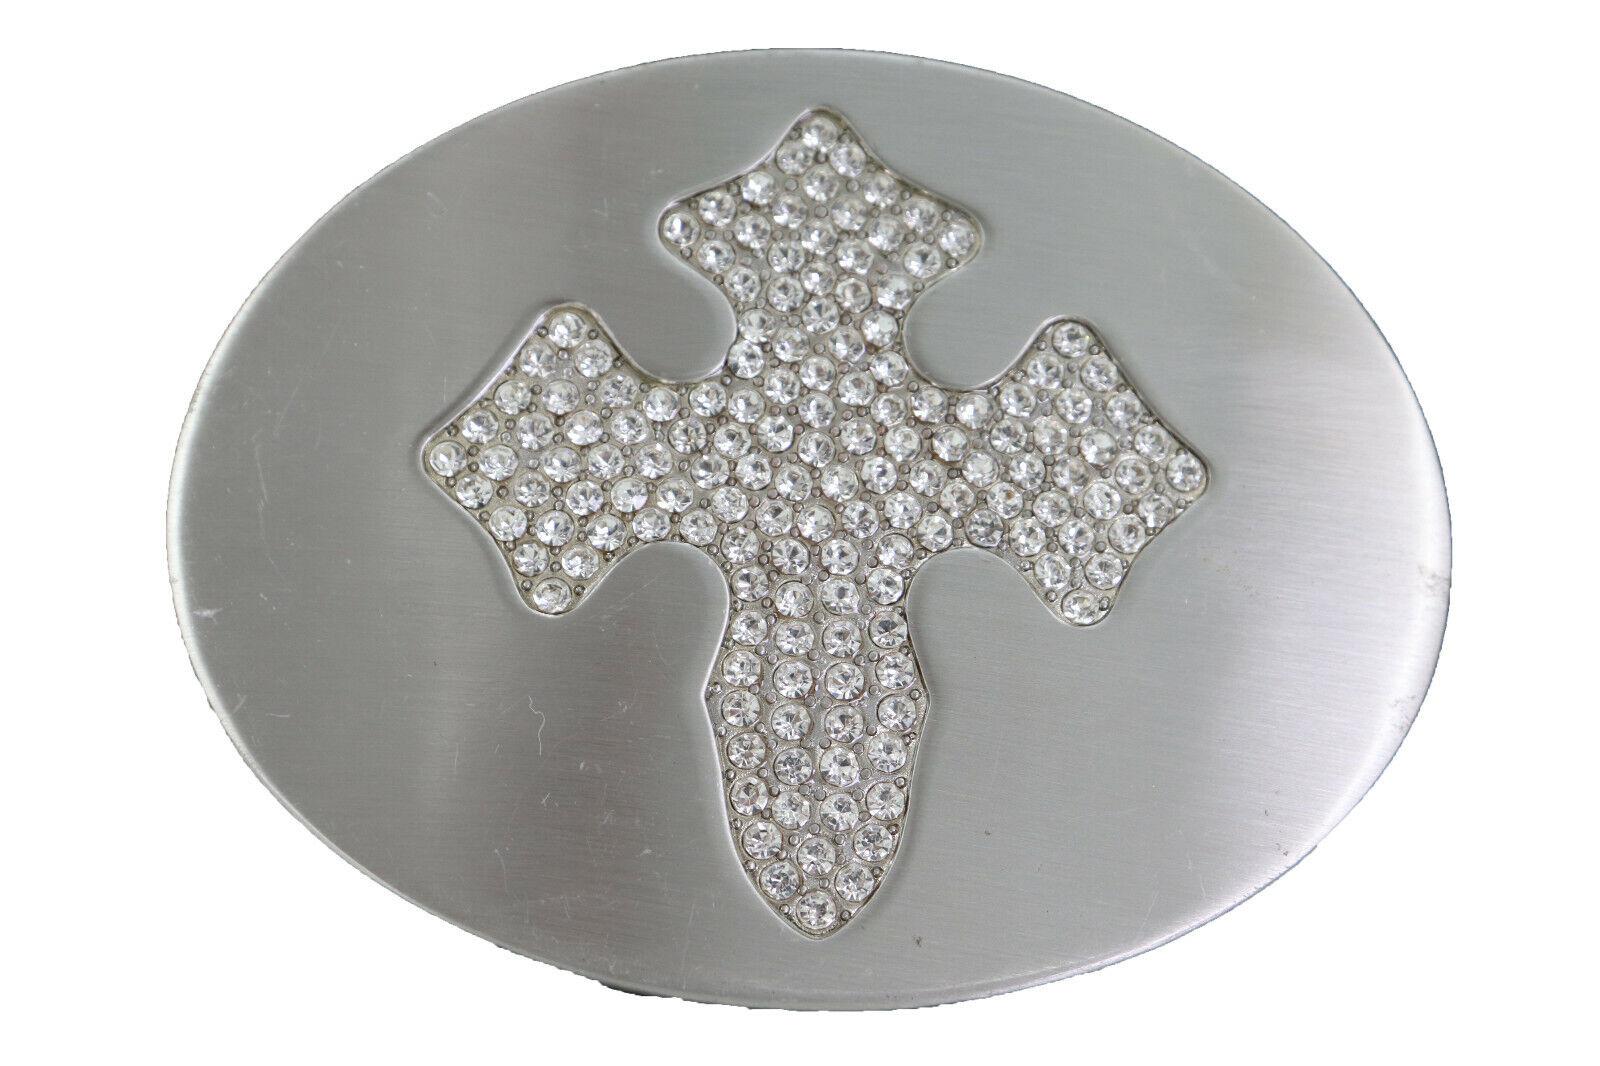 Herren Damen Cowboy Western Gürtelschnalle Silber Metall Groß Oval Kreuz Special